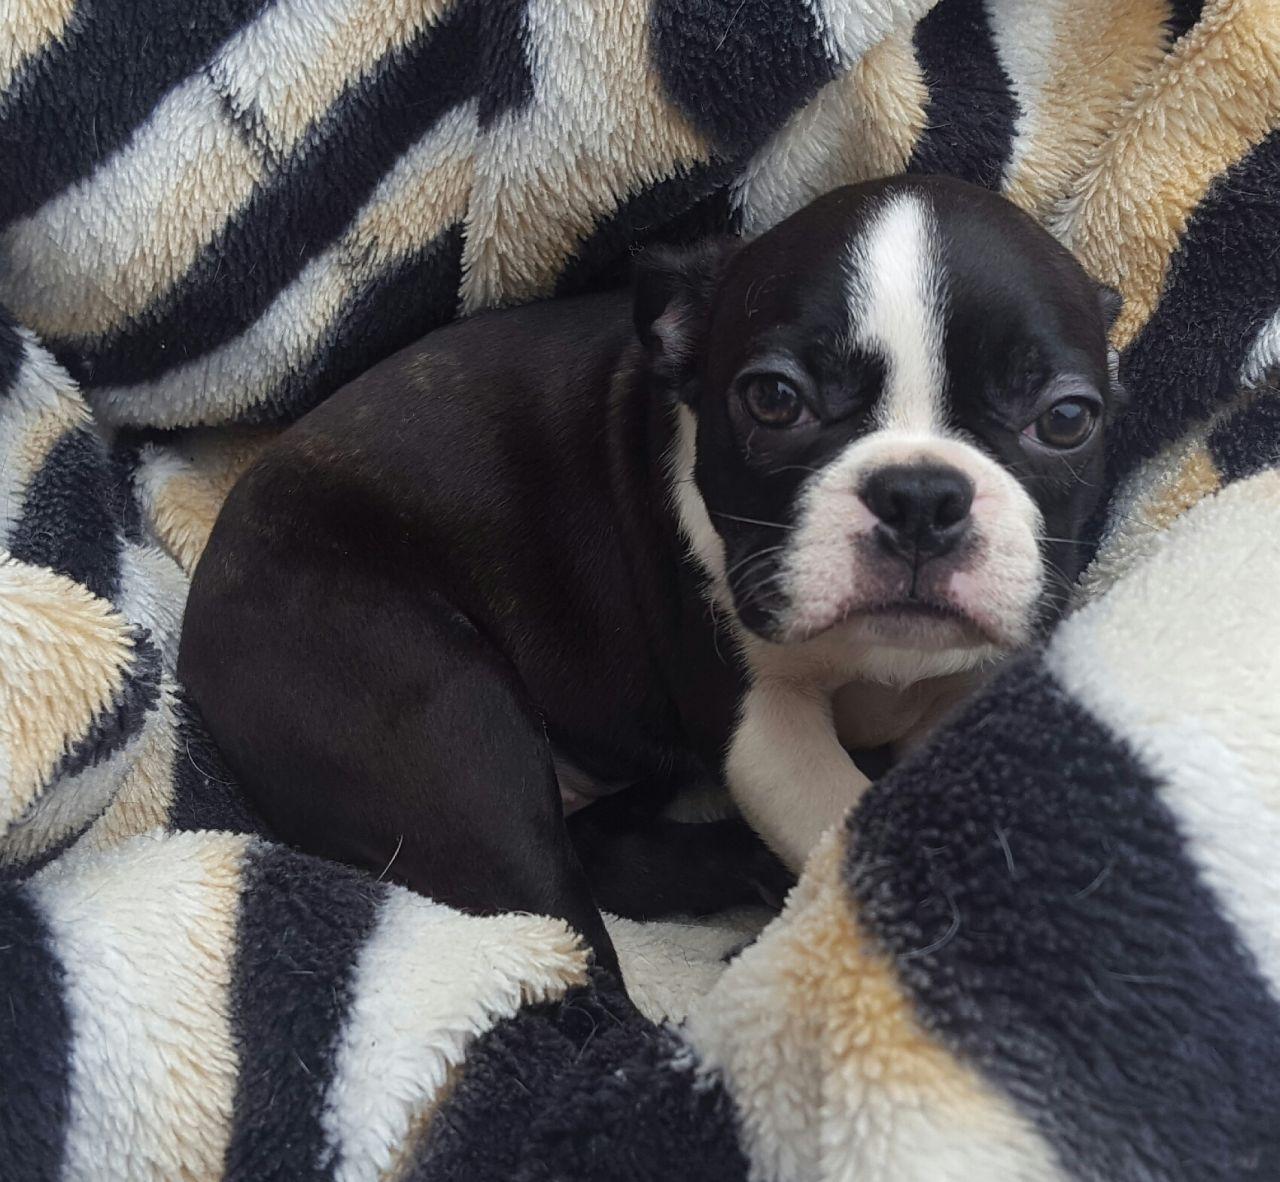 Boston Terrier Puppies For Sale Pennsylvania Avenue Northwest Dc